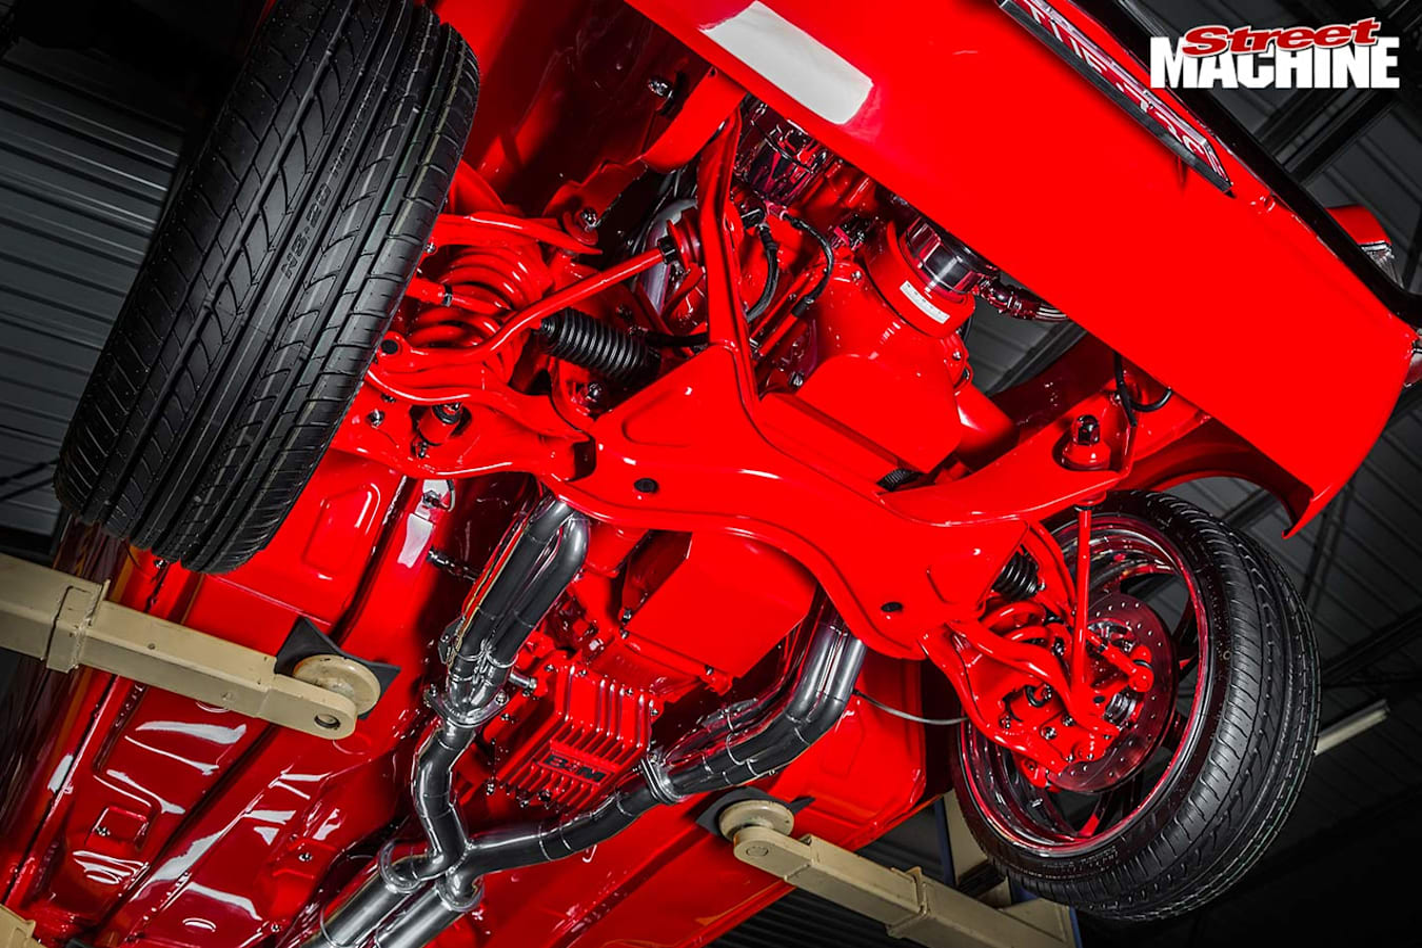 Ford Cortina underside